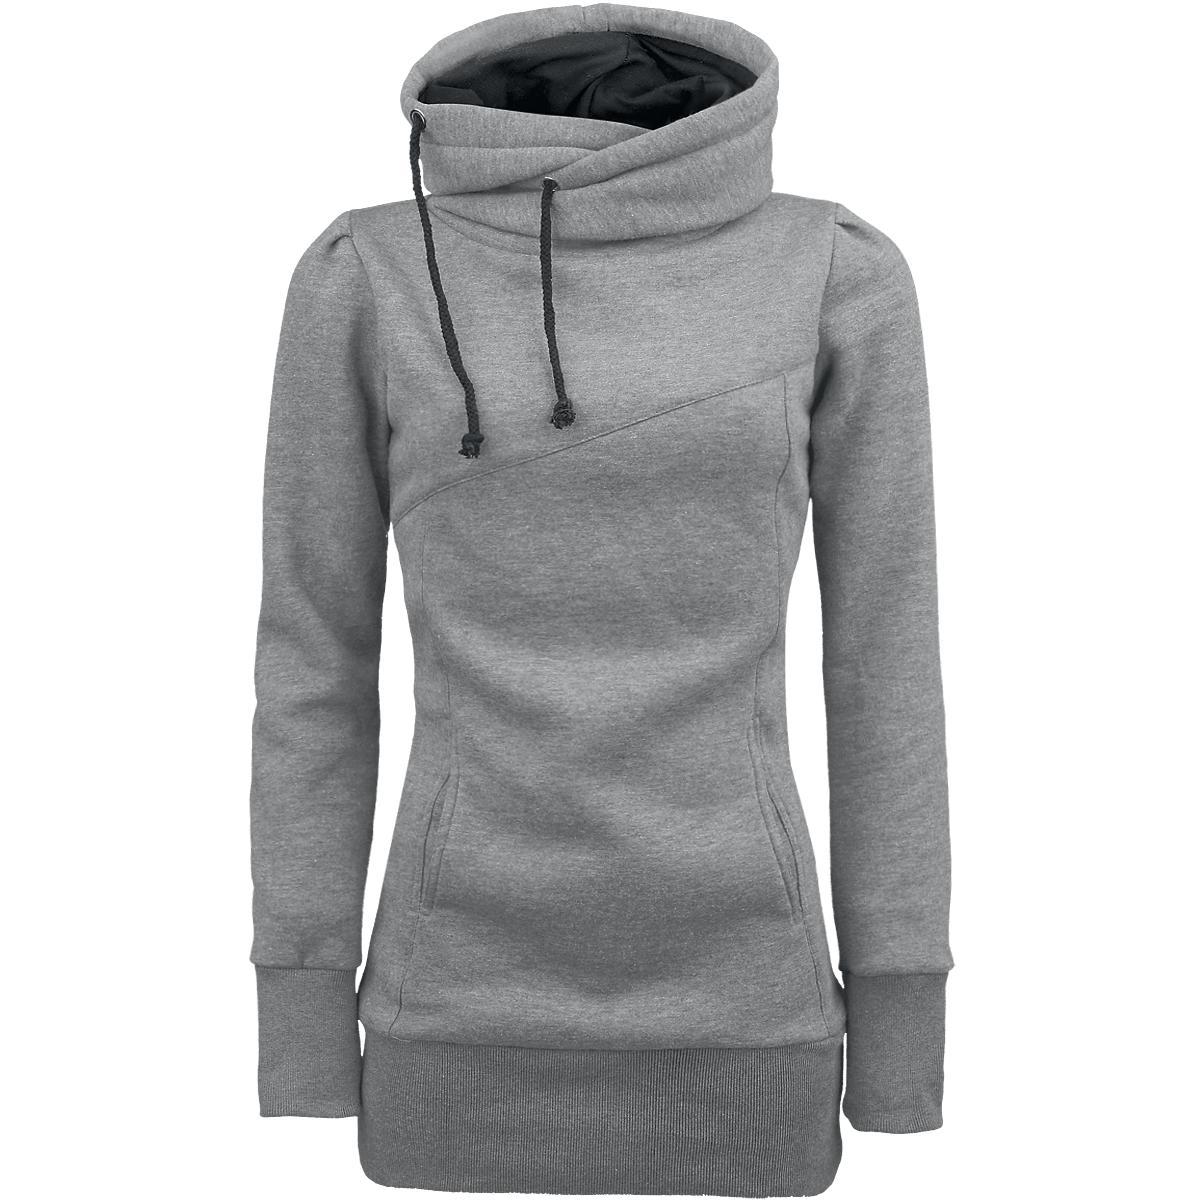 smart hoodie girl kapuzenpulli girl kapuzenpulli frauen grau emp. Black Bedroom Furniture Sets. Home Design Ideas